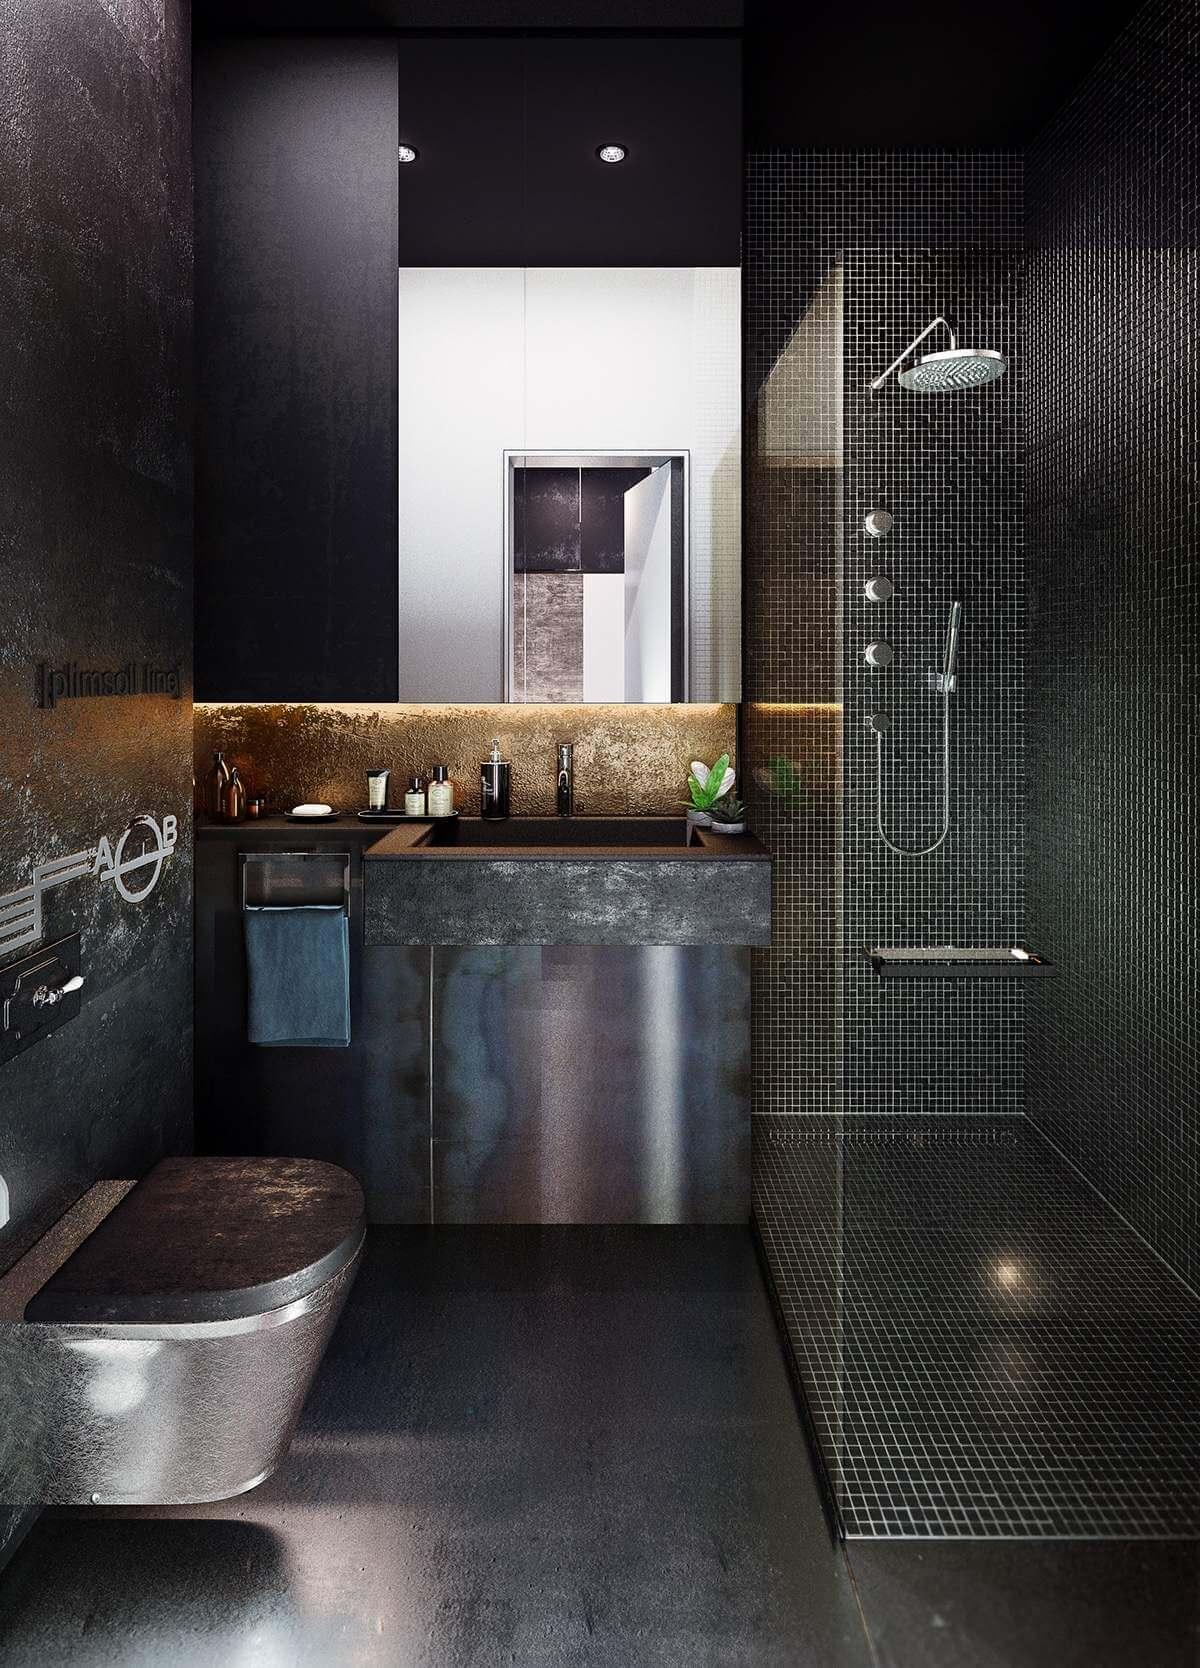 Metallic steampunk bathroom